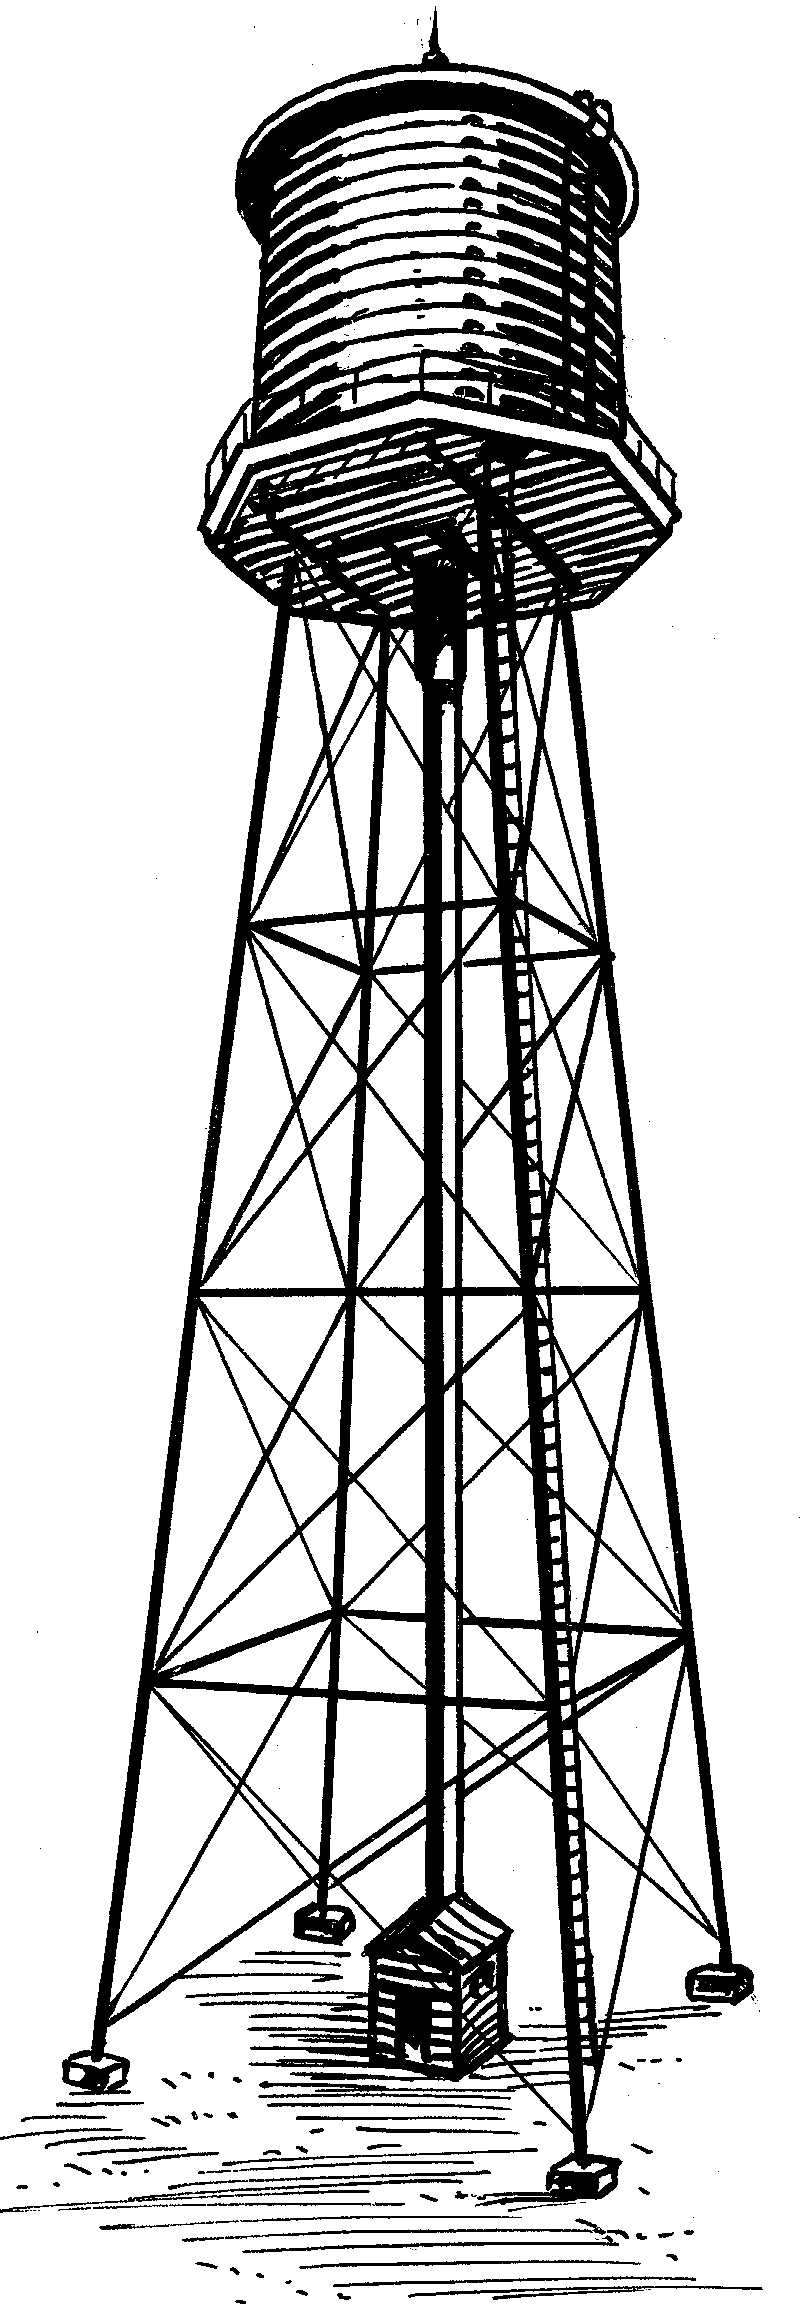 filetank water tower psfpng the work of gods children